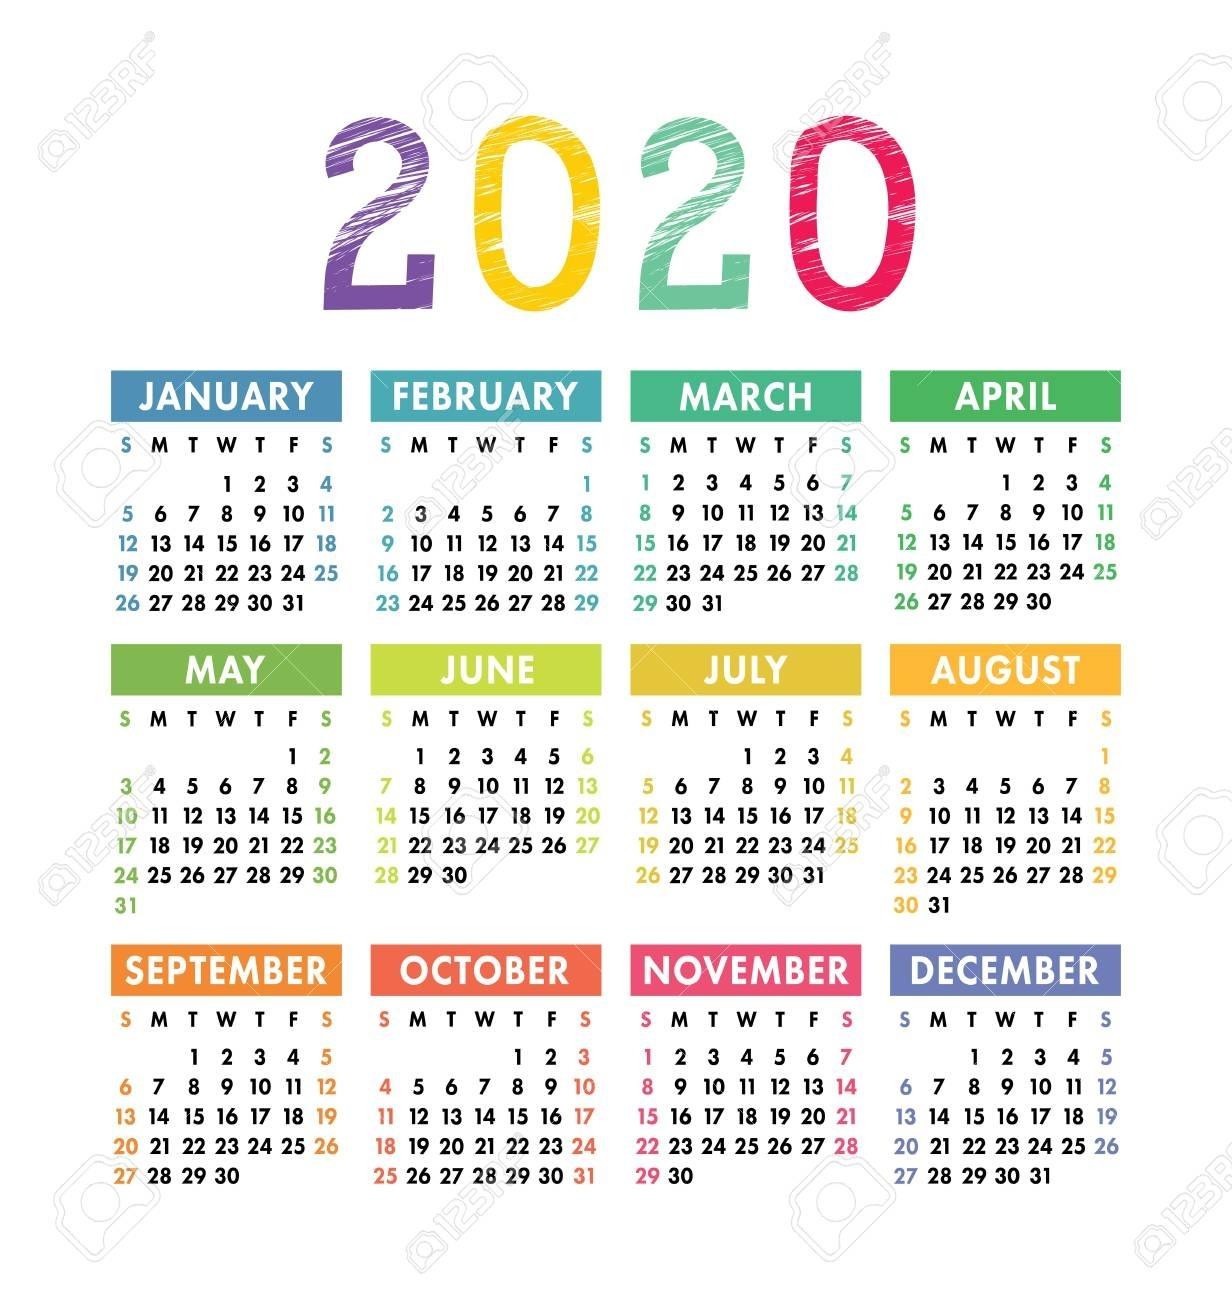 Calendar 2020 Year. Vector Pocket Or Wall Calender Template inside 2020 Pocket Size Calendar Free